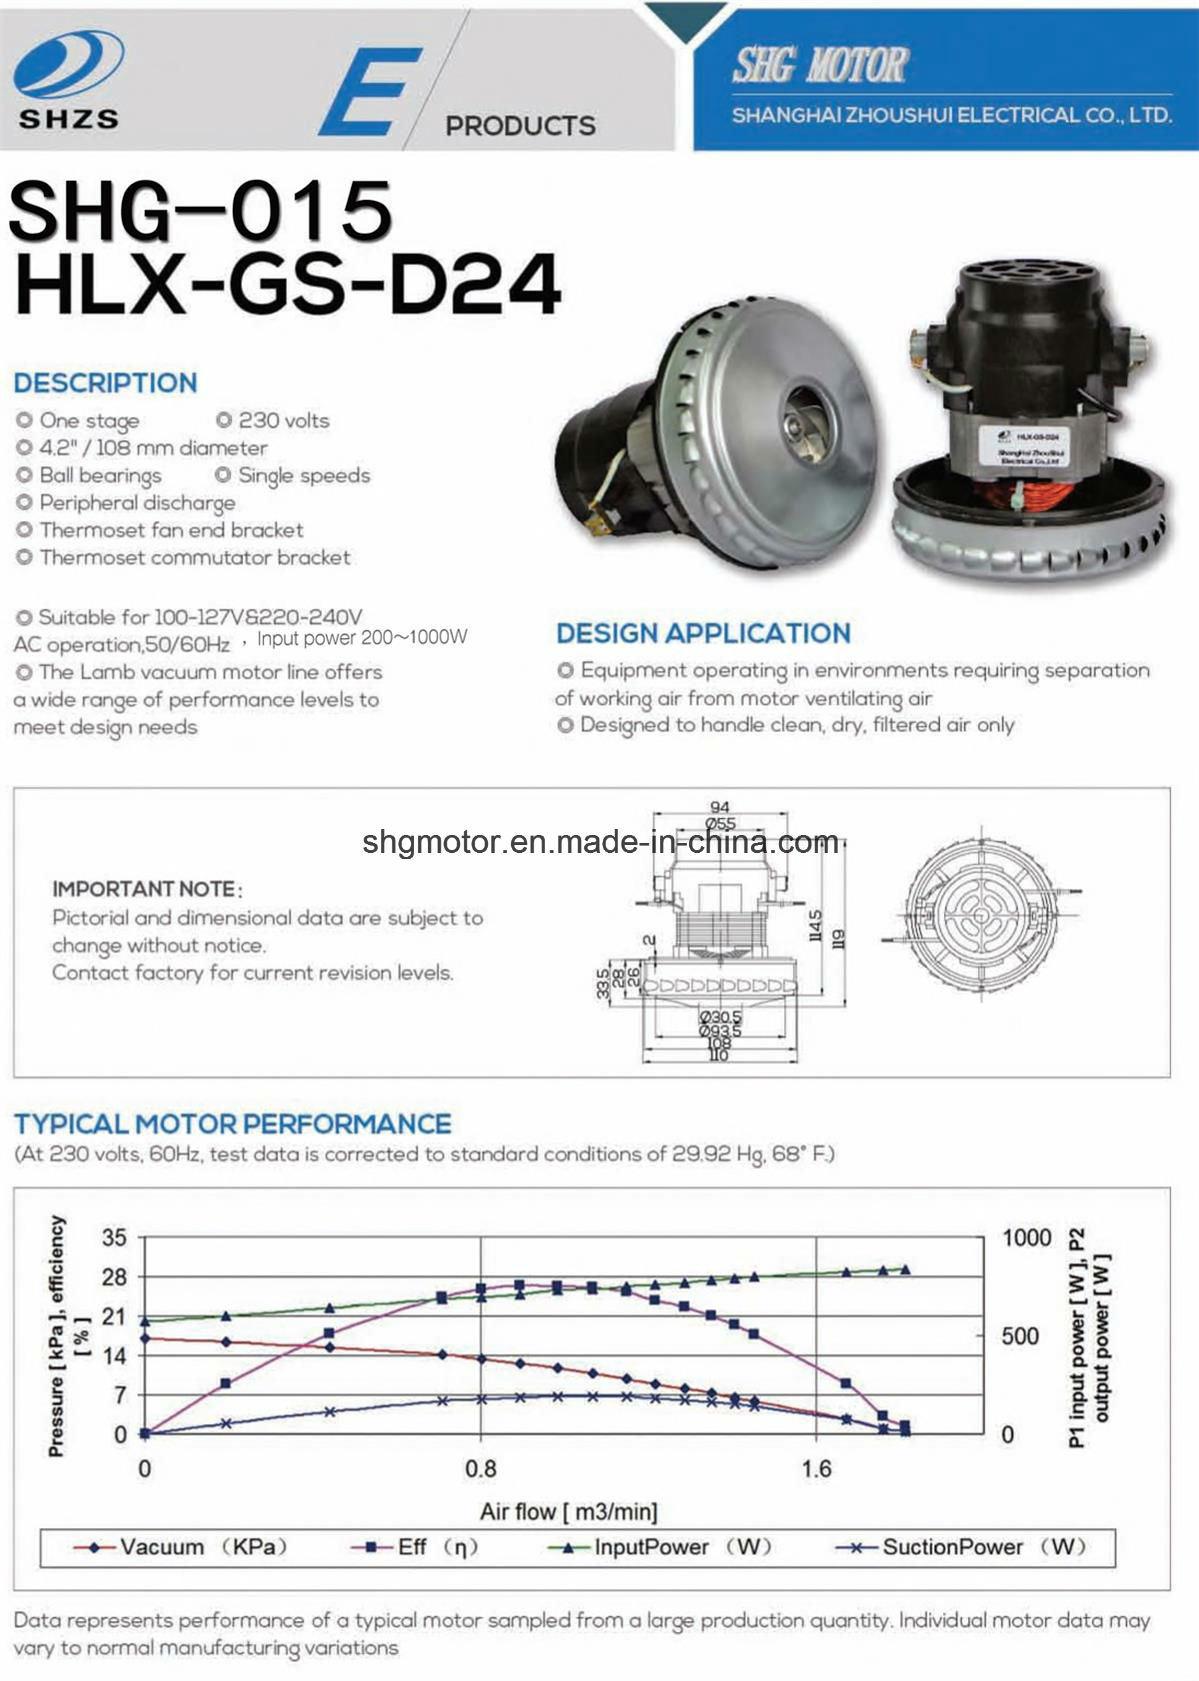 High Quality, Long Life Vacuum Motor (SHG-015)